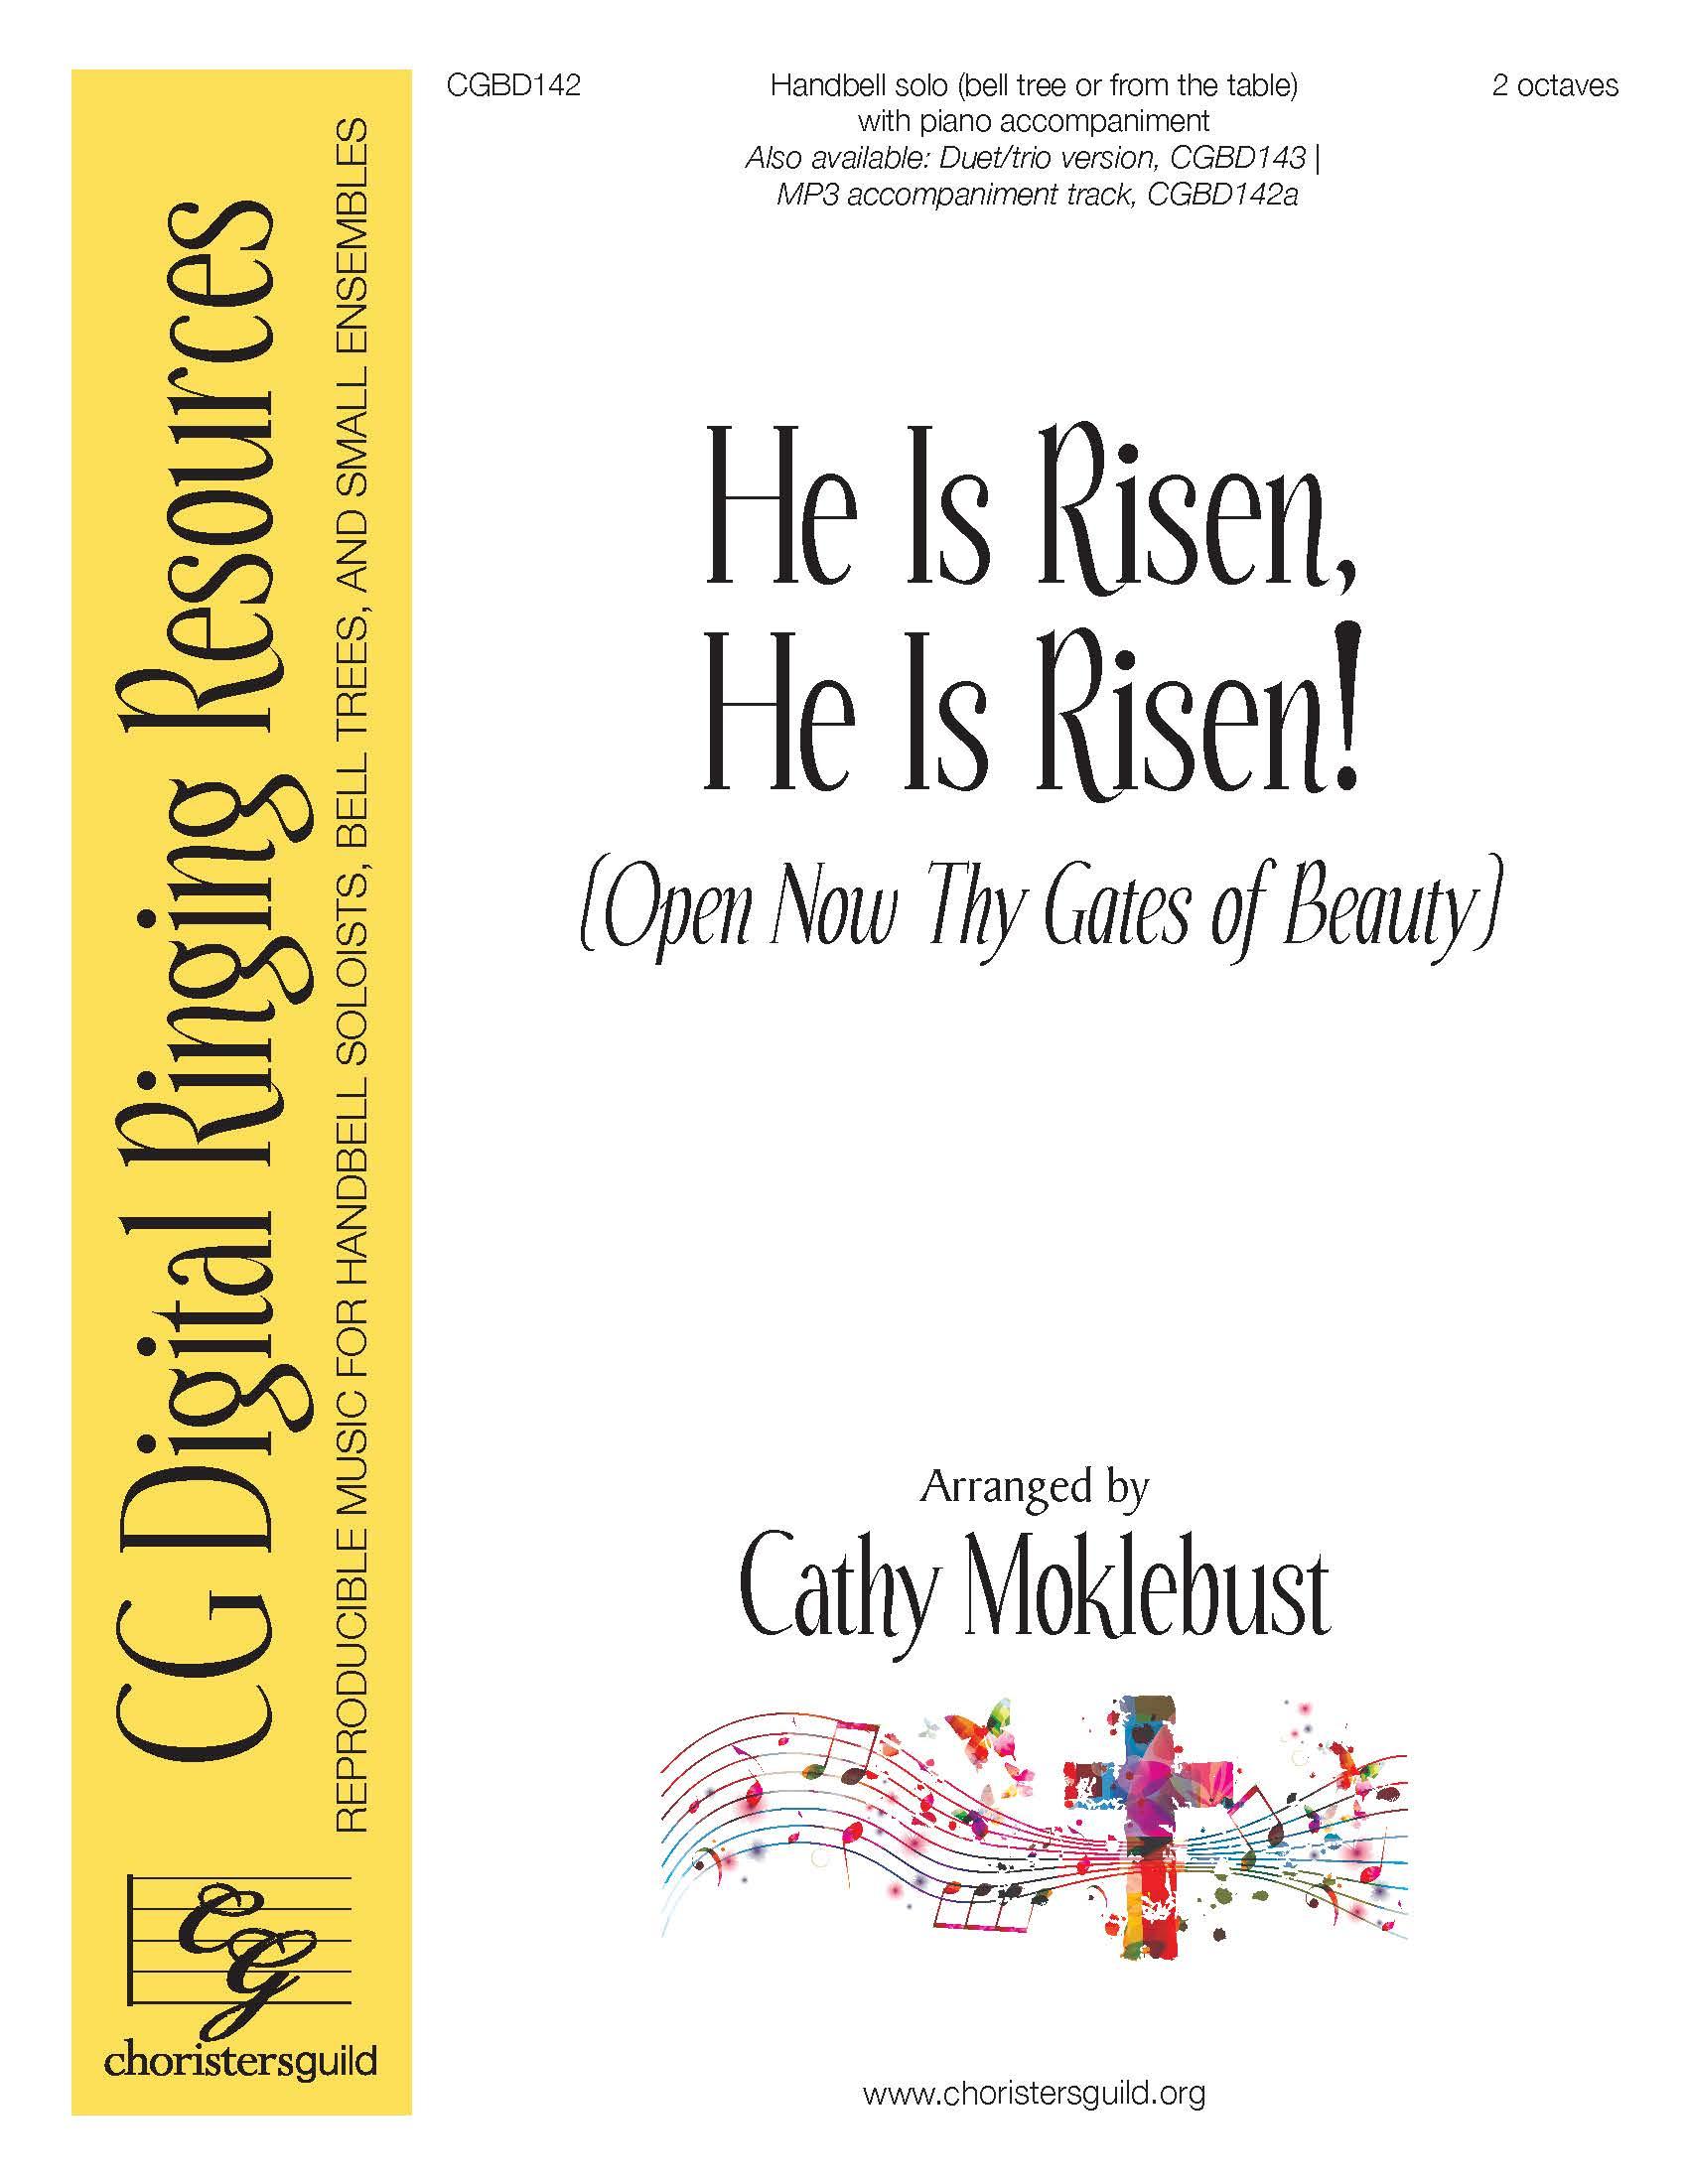 He is Risen, He is Risen! - Digital Accompaniment Track